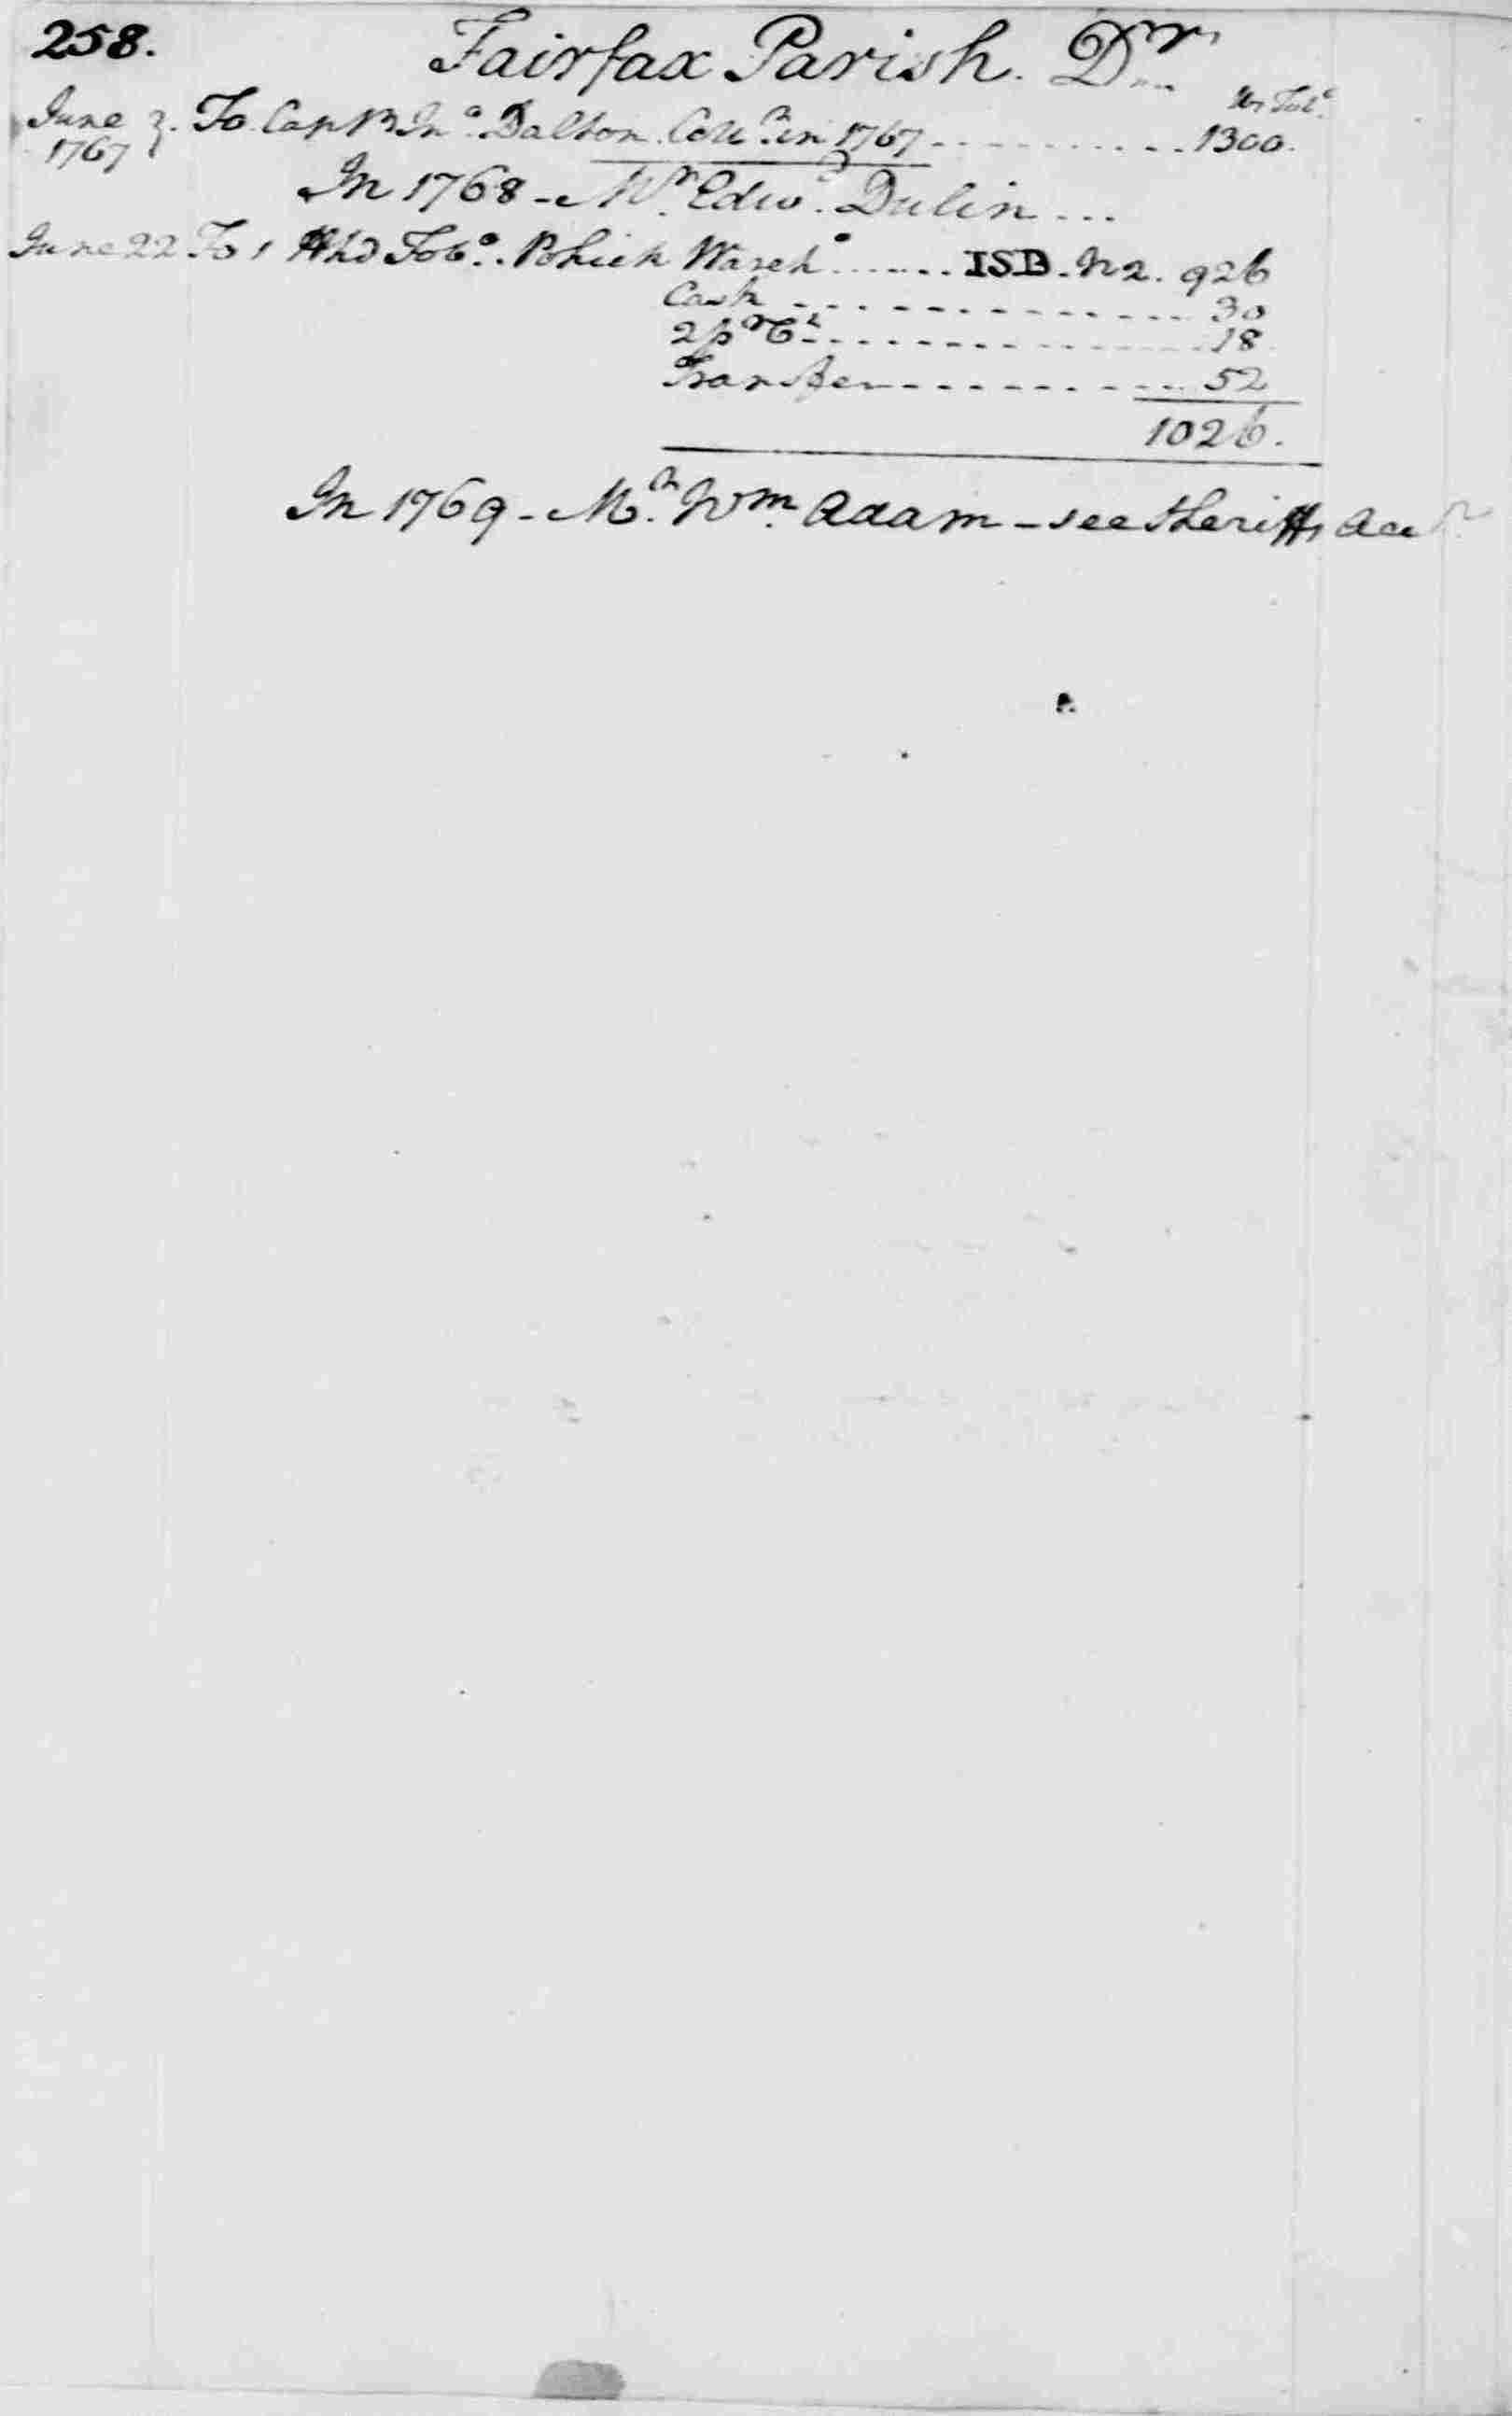 Ledger A, folio 258, left side